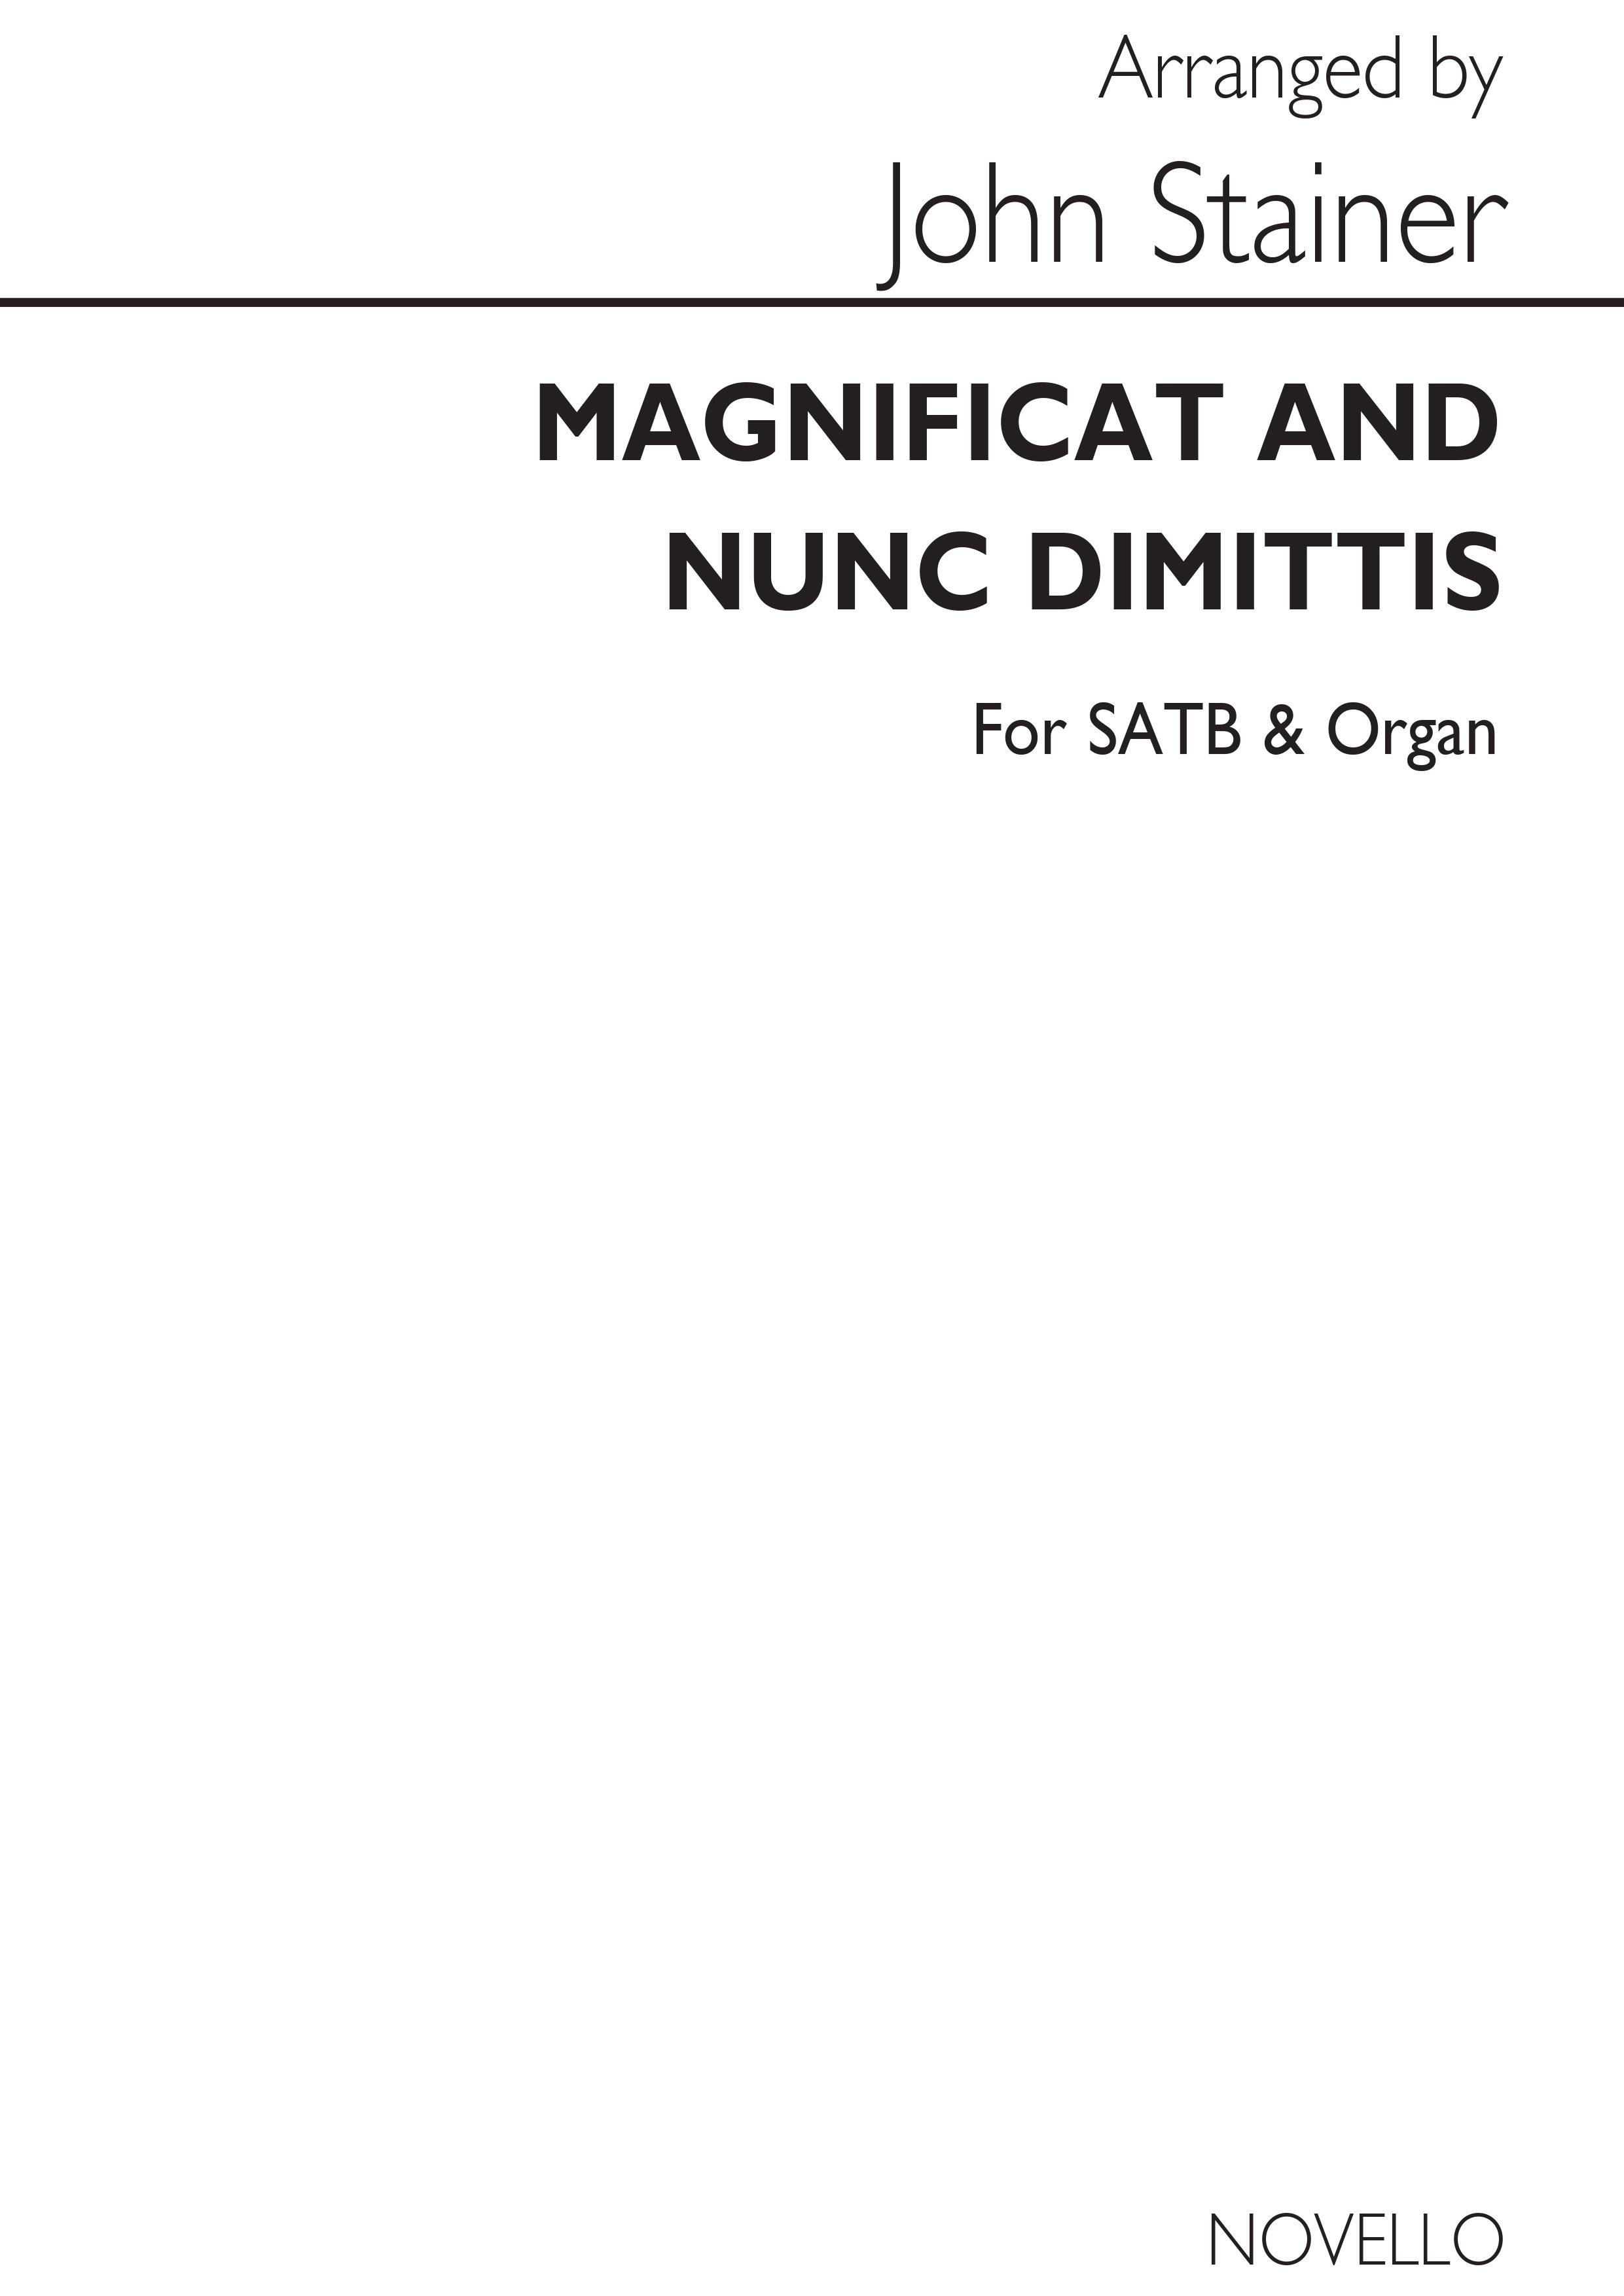 Sir John Stainer: Magnificat & Nunc Dimittis 4th Series: SATB: Vocal Score